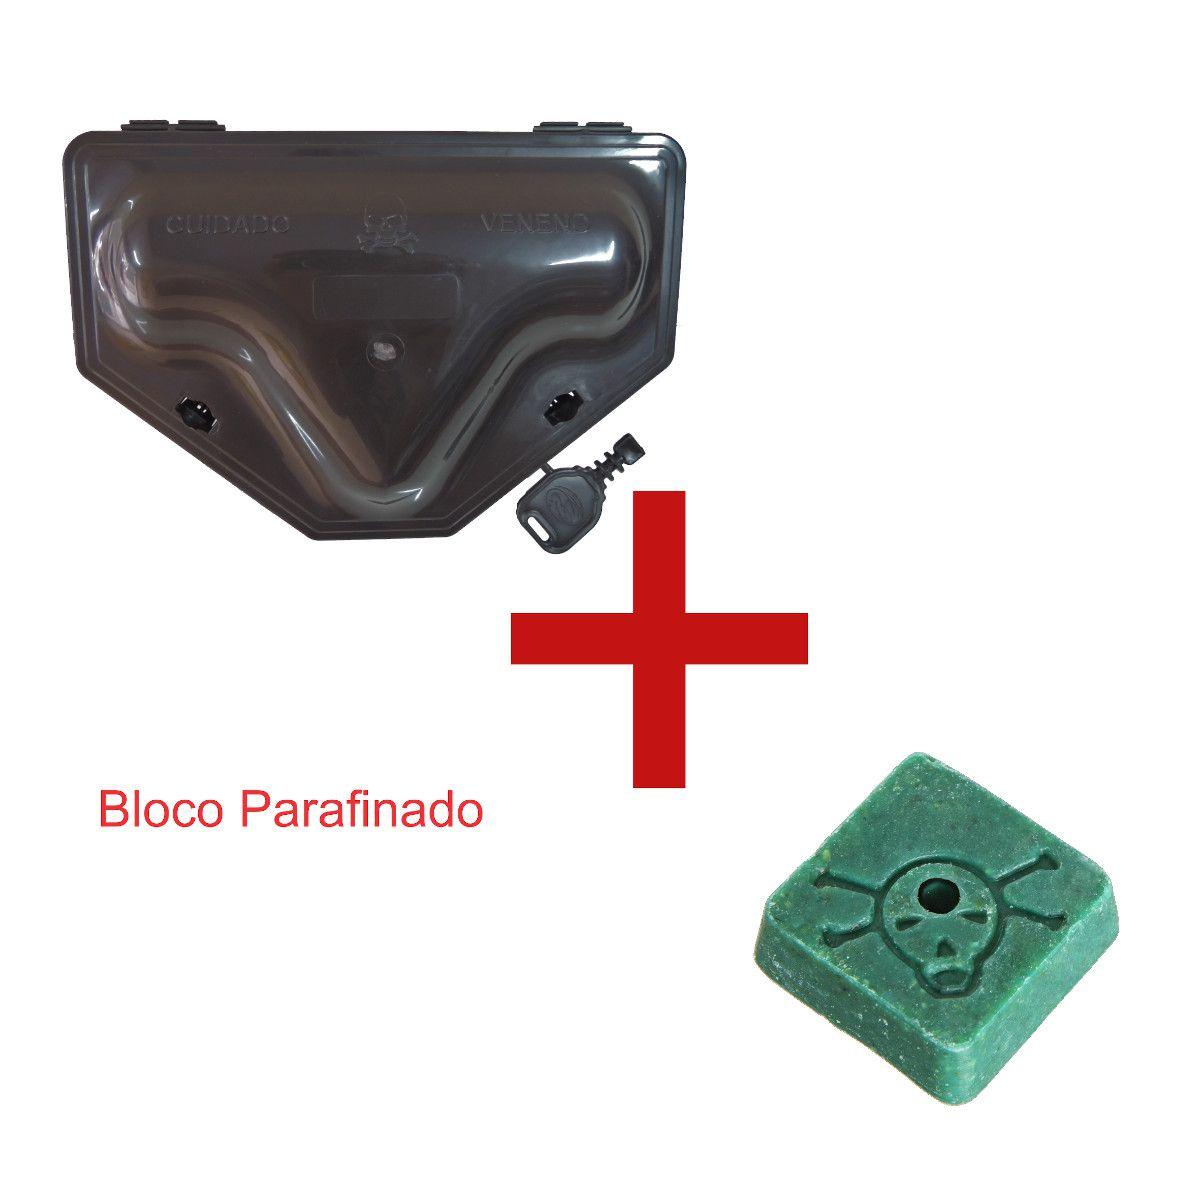 KIT 700 Armadilha Pega Mata Porta Iscas Forte 2 TRAVAS Chave